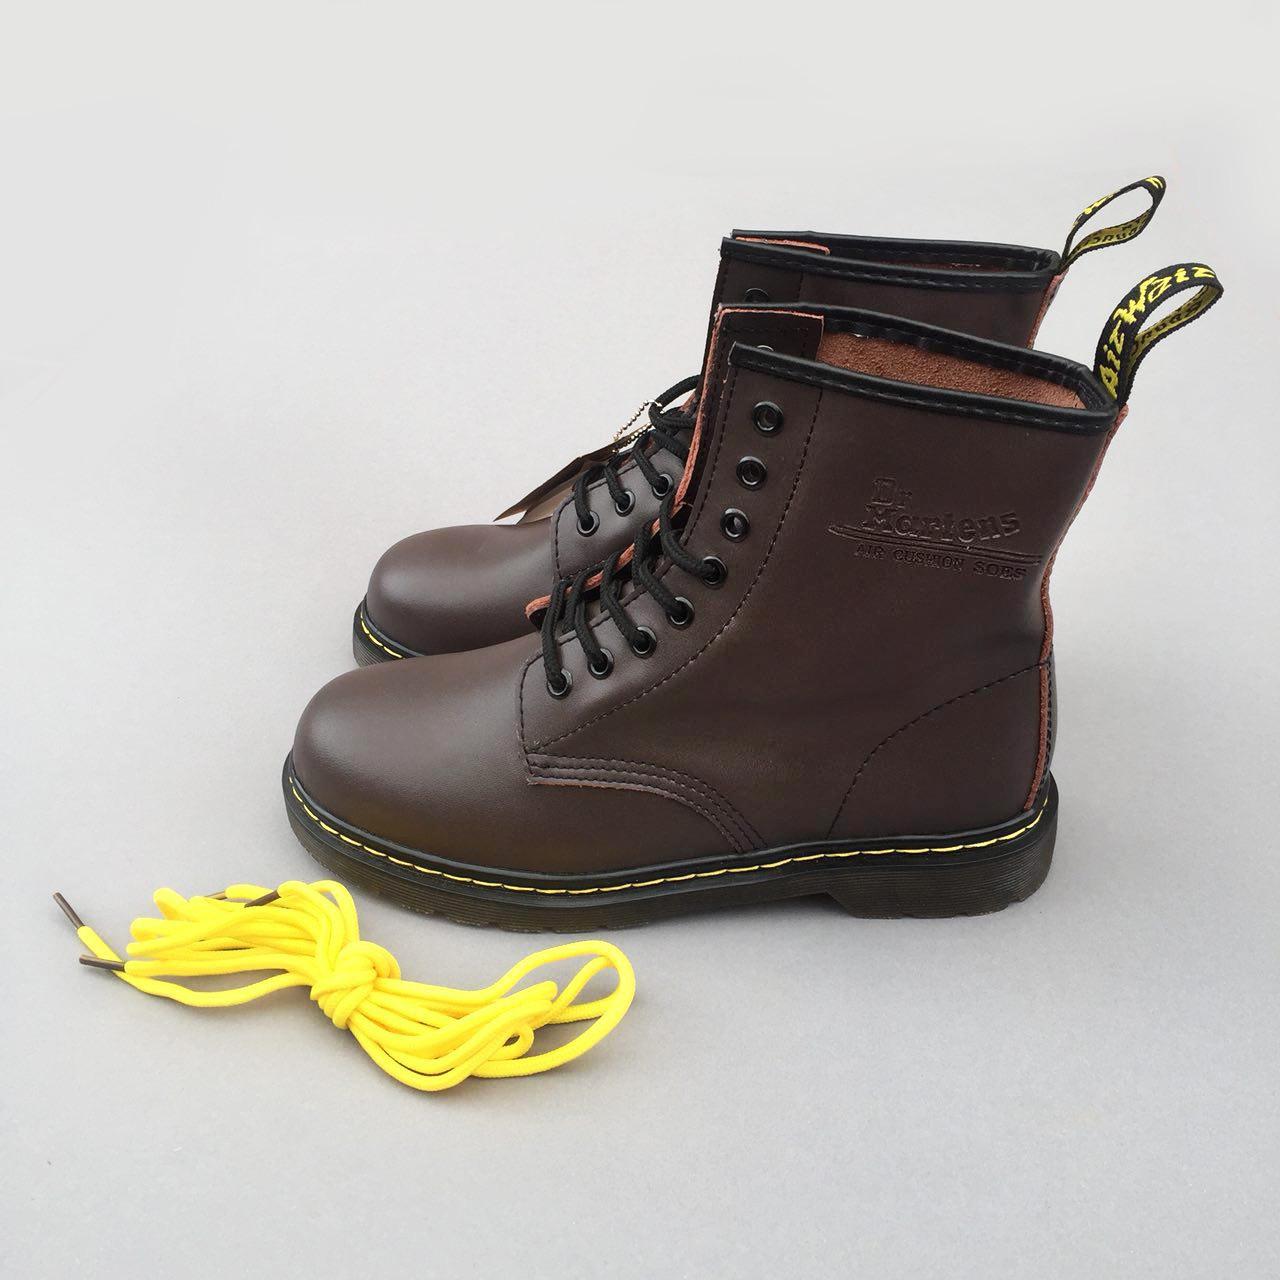 "Ботинки Dr. Martens Air Cushion Shoes ""Brown"" (Коричневые)"